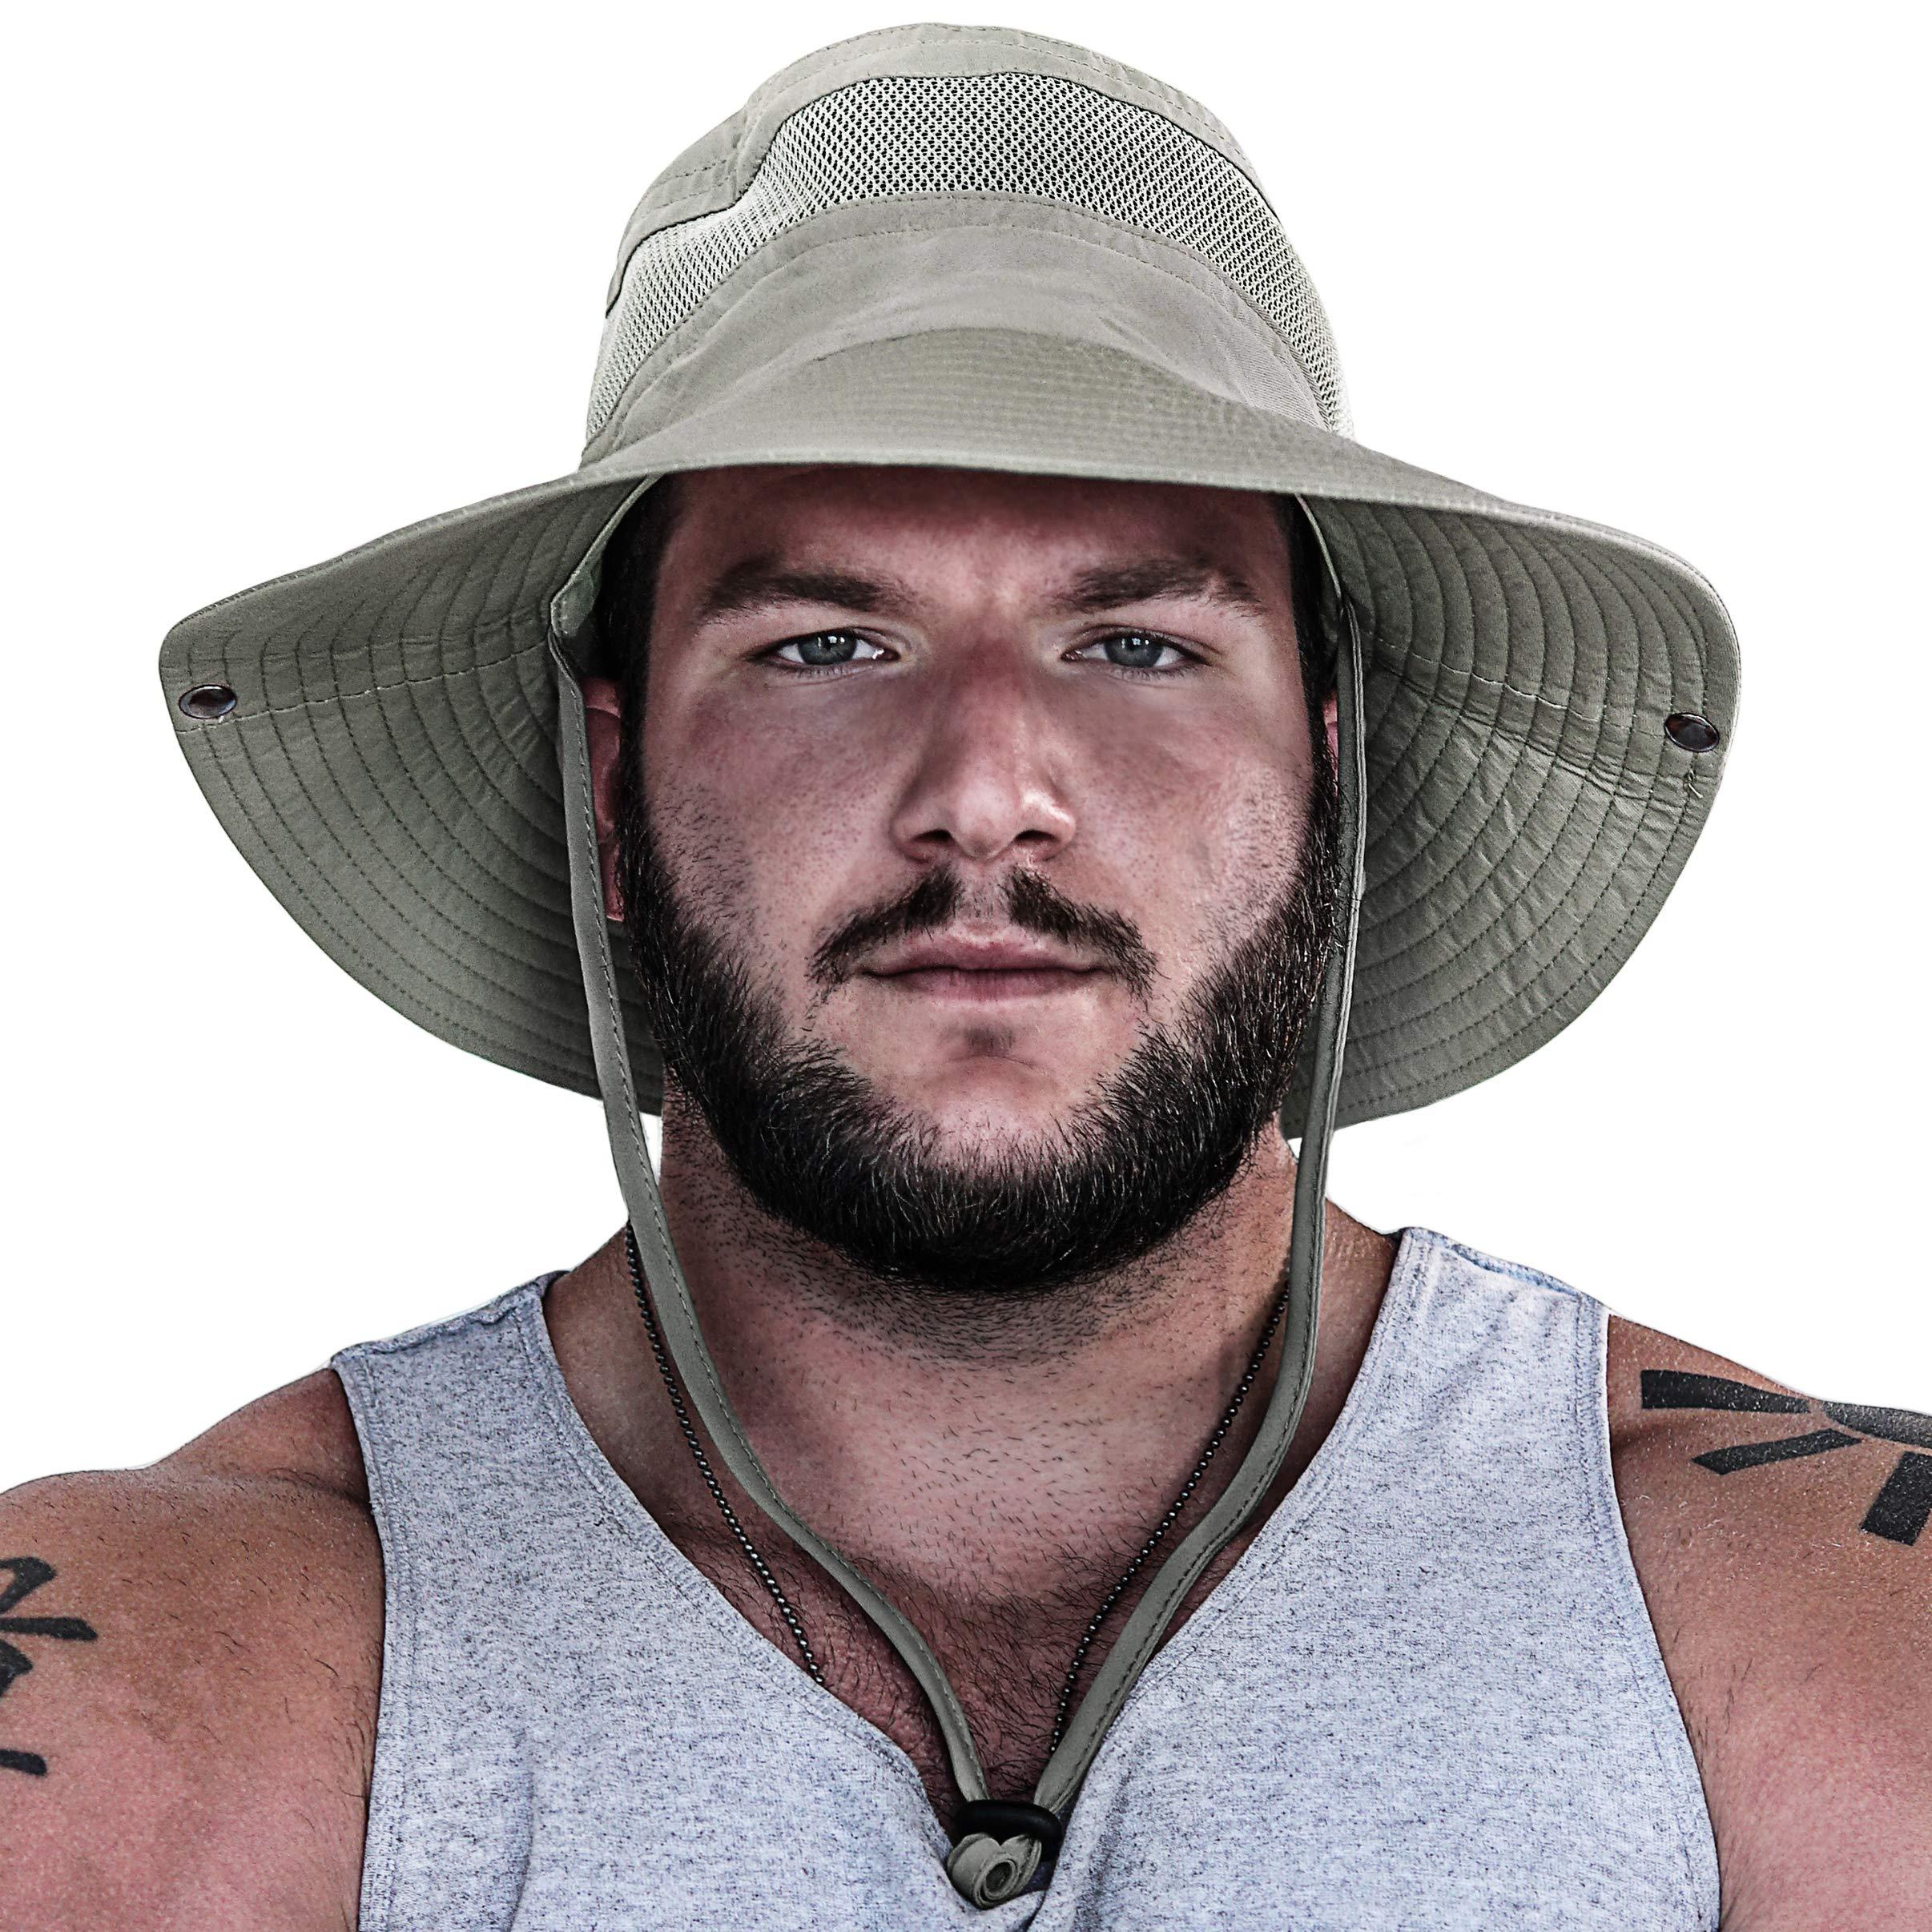 GearTOP Fishing Hat (Khaki - 2 Pack) by GearTOP (Image #3)